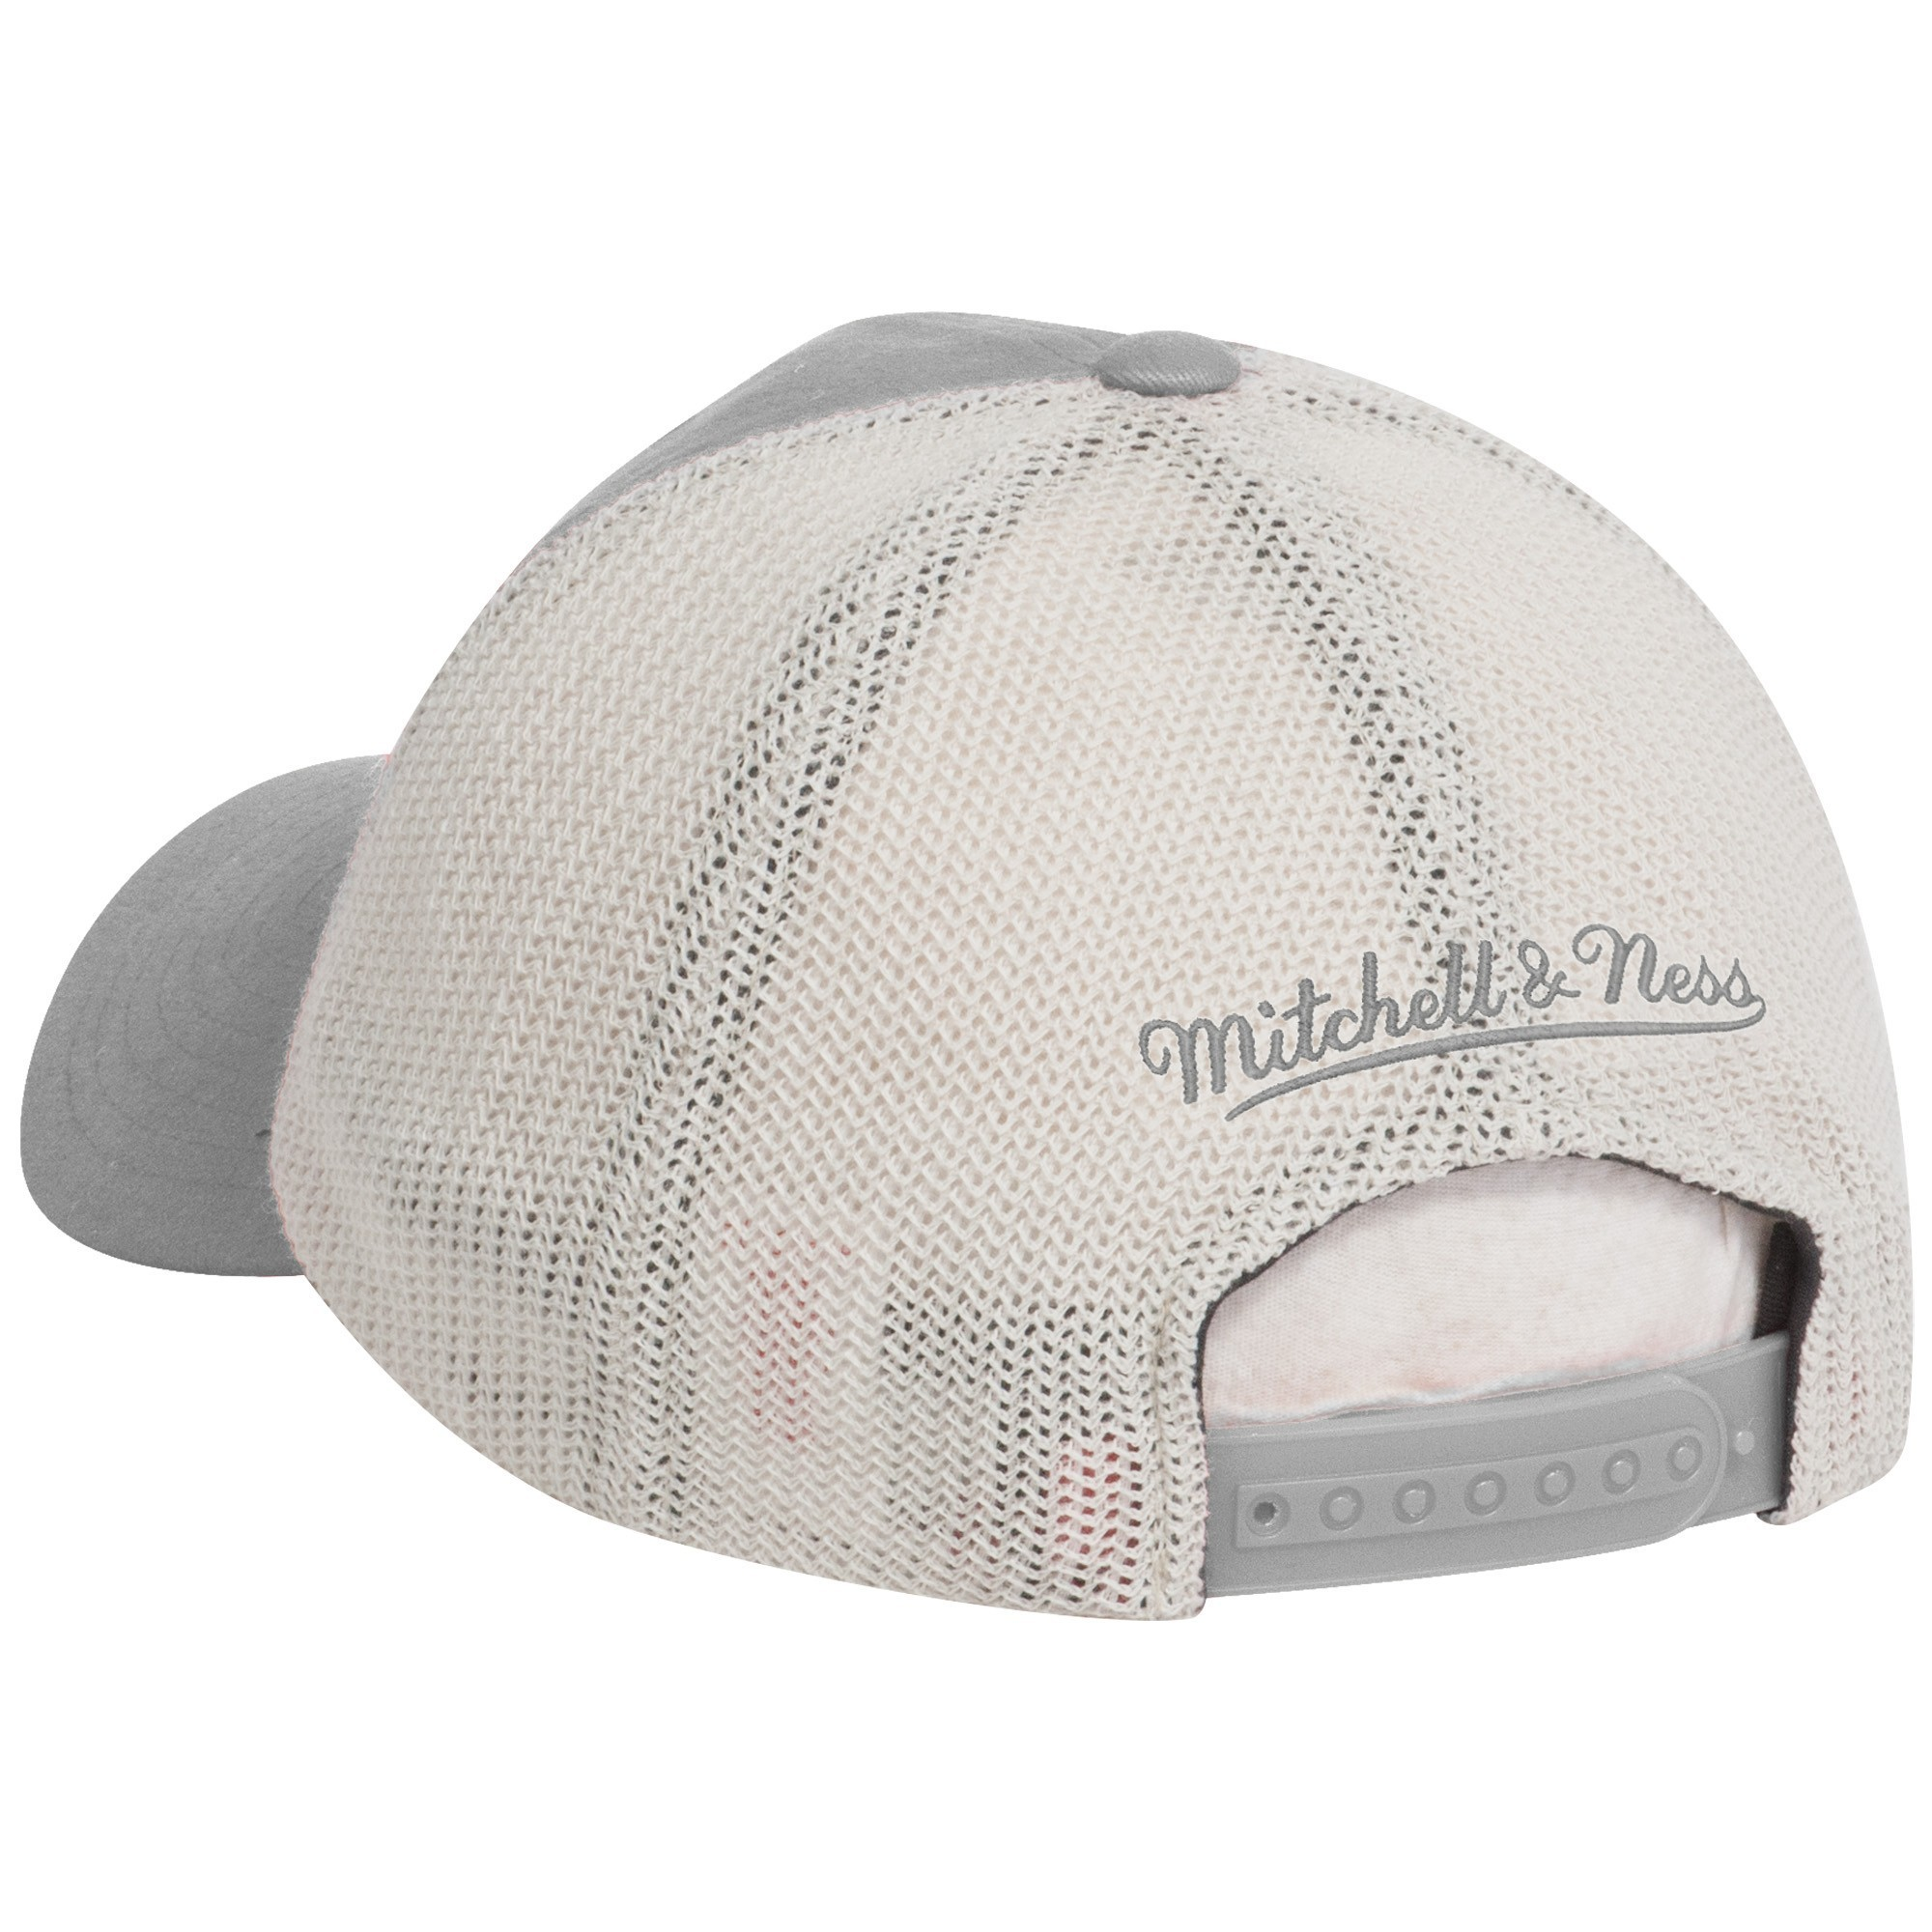 hot sale online fd61b 93410 cappello-visiera-curva-mitchell-ness-cap-baseball -adjustable-nba-brooklyn-nets-morbido-slouch-mesh-grey-black-unico.jpg